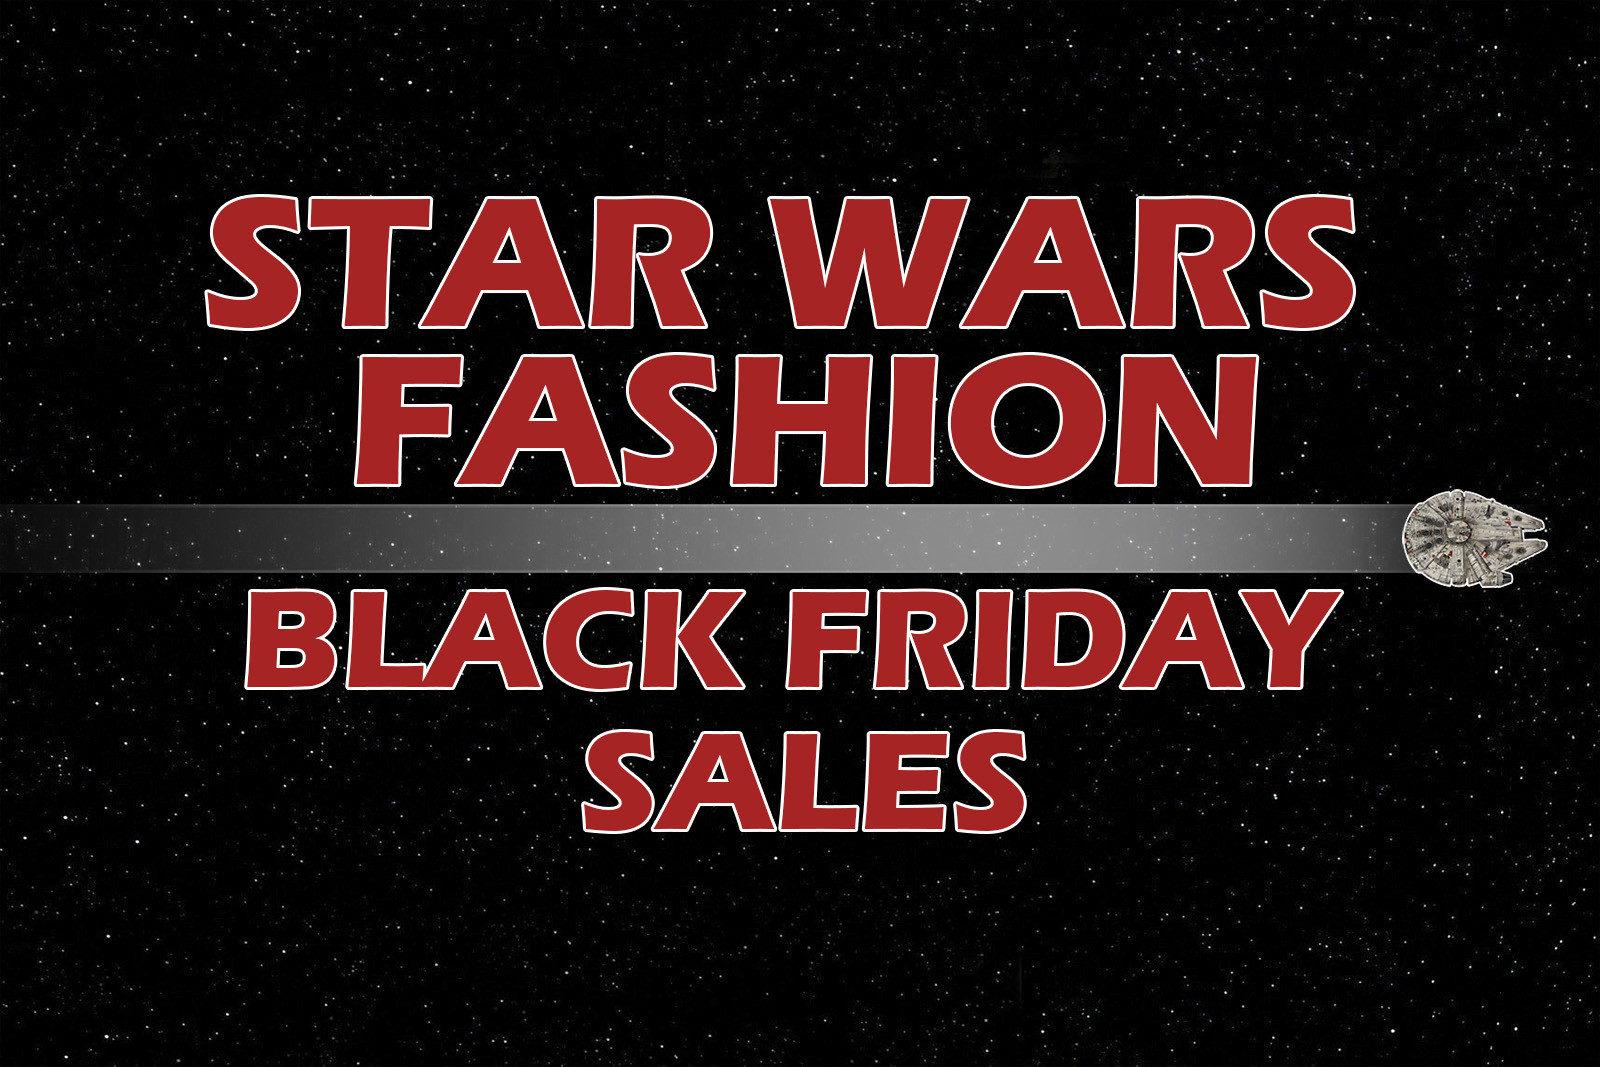 Black Friday 2018 – Star Wars Fashion Sales